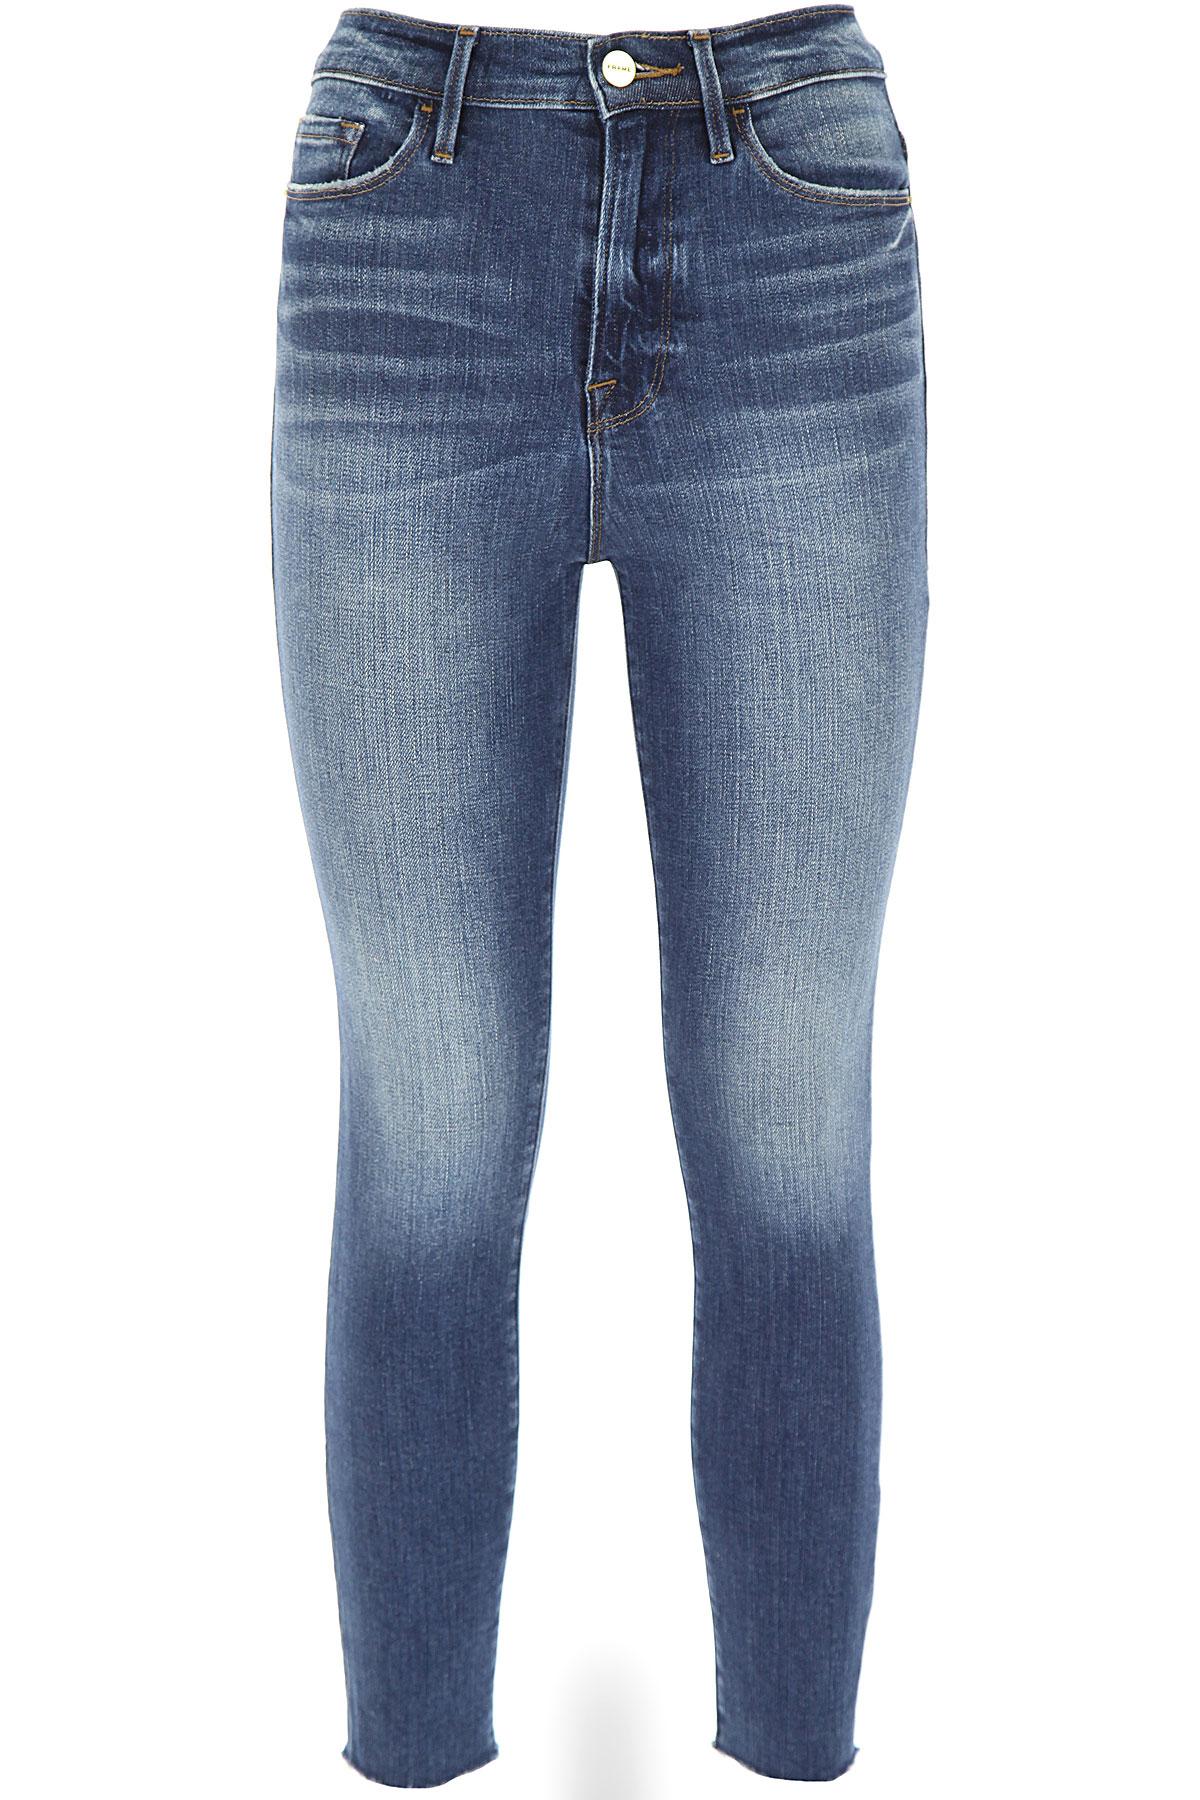 Frame Jeans On Sale, Denim, Cotton, 2019, US 27 - UK 8/10 - IT 42 US 29 - UK 12 - IT 46